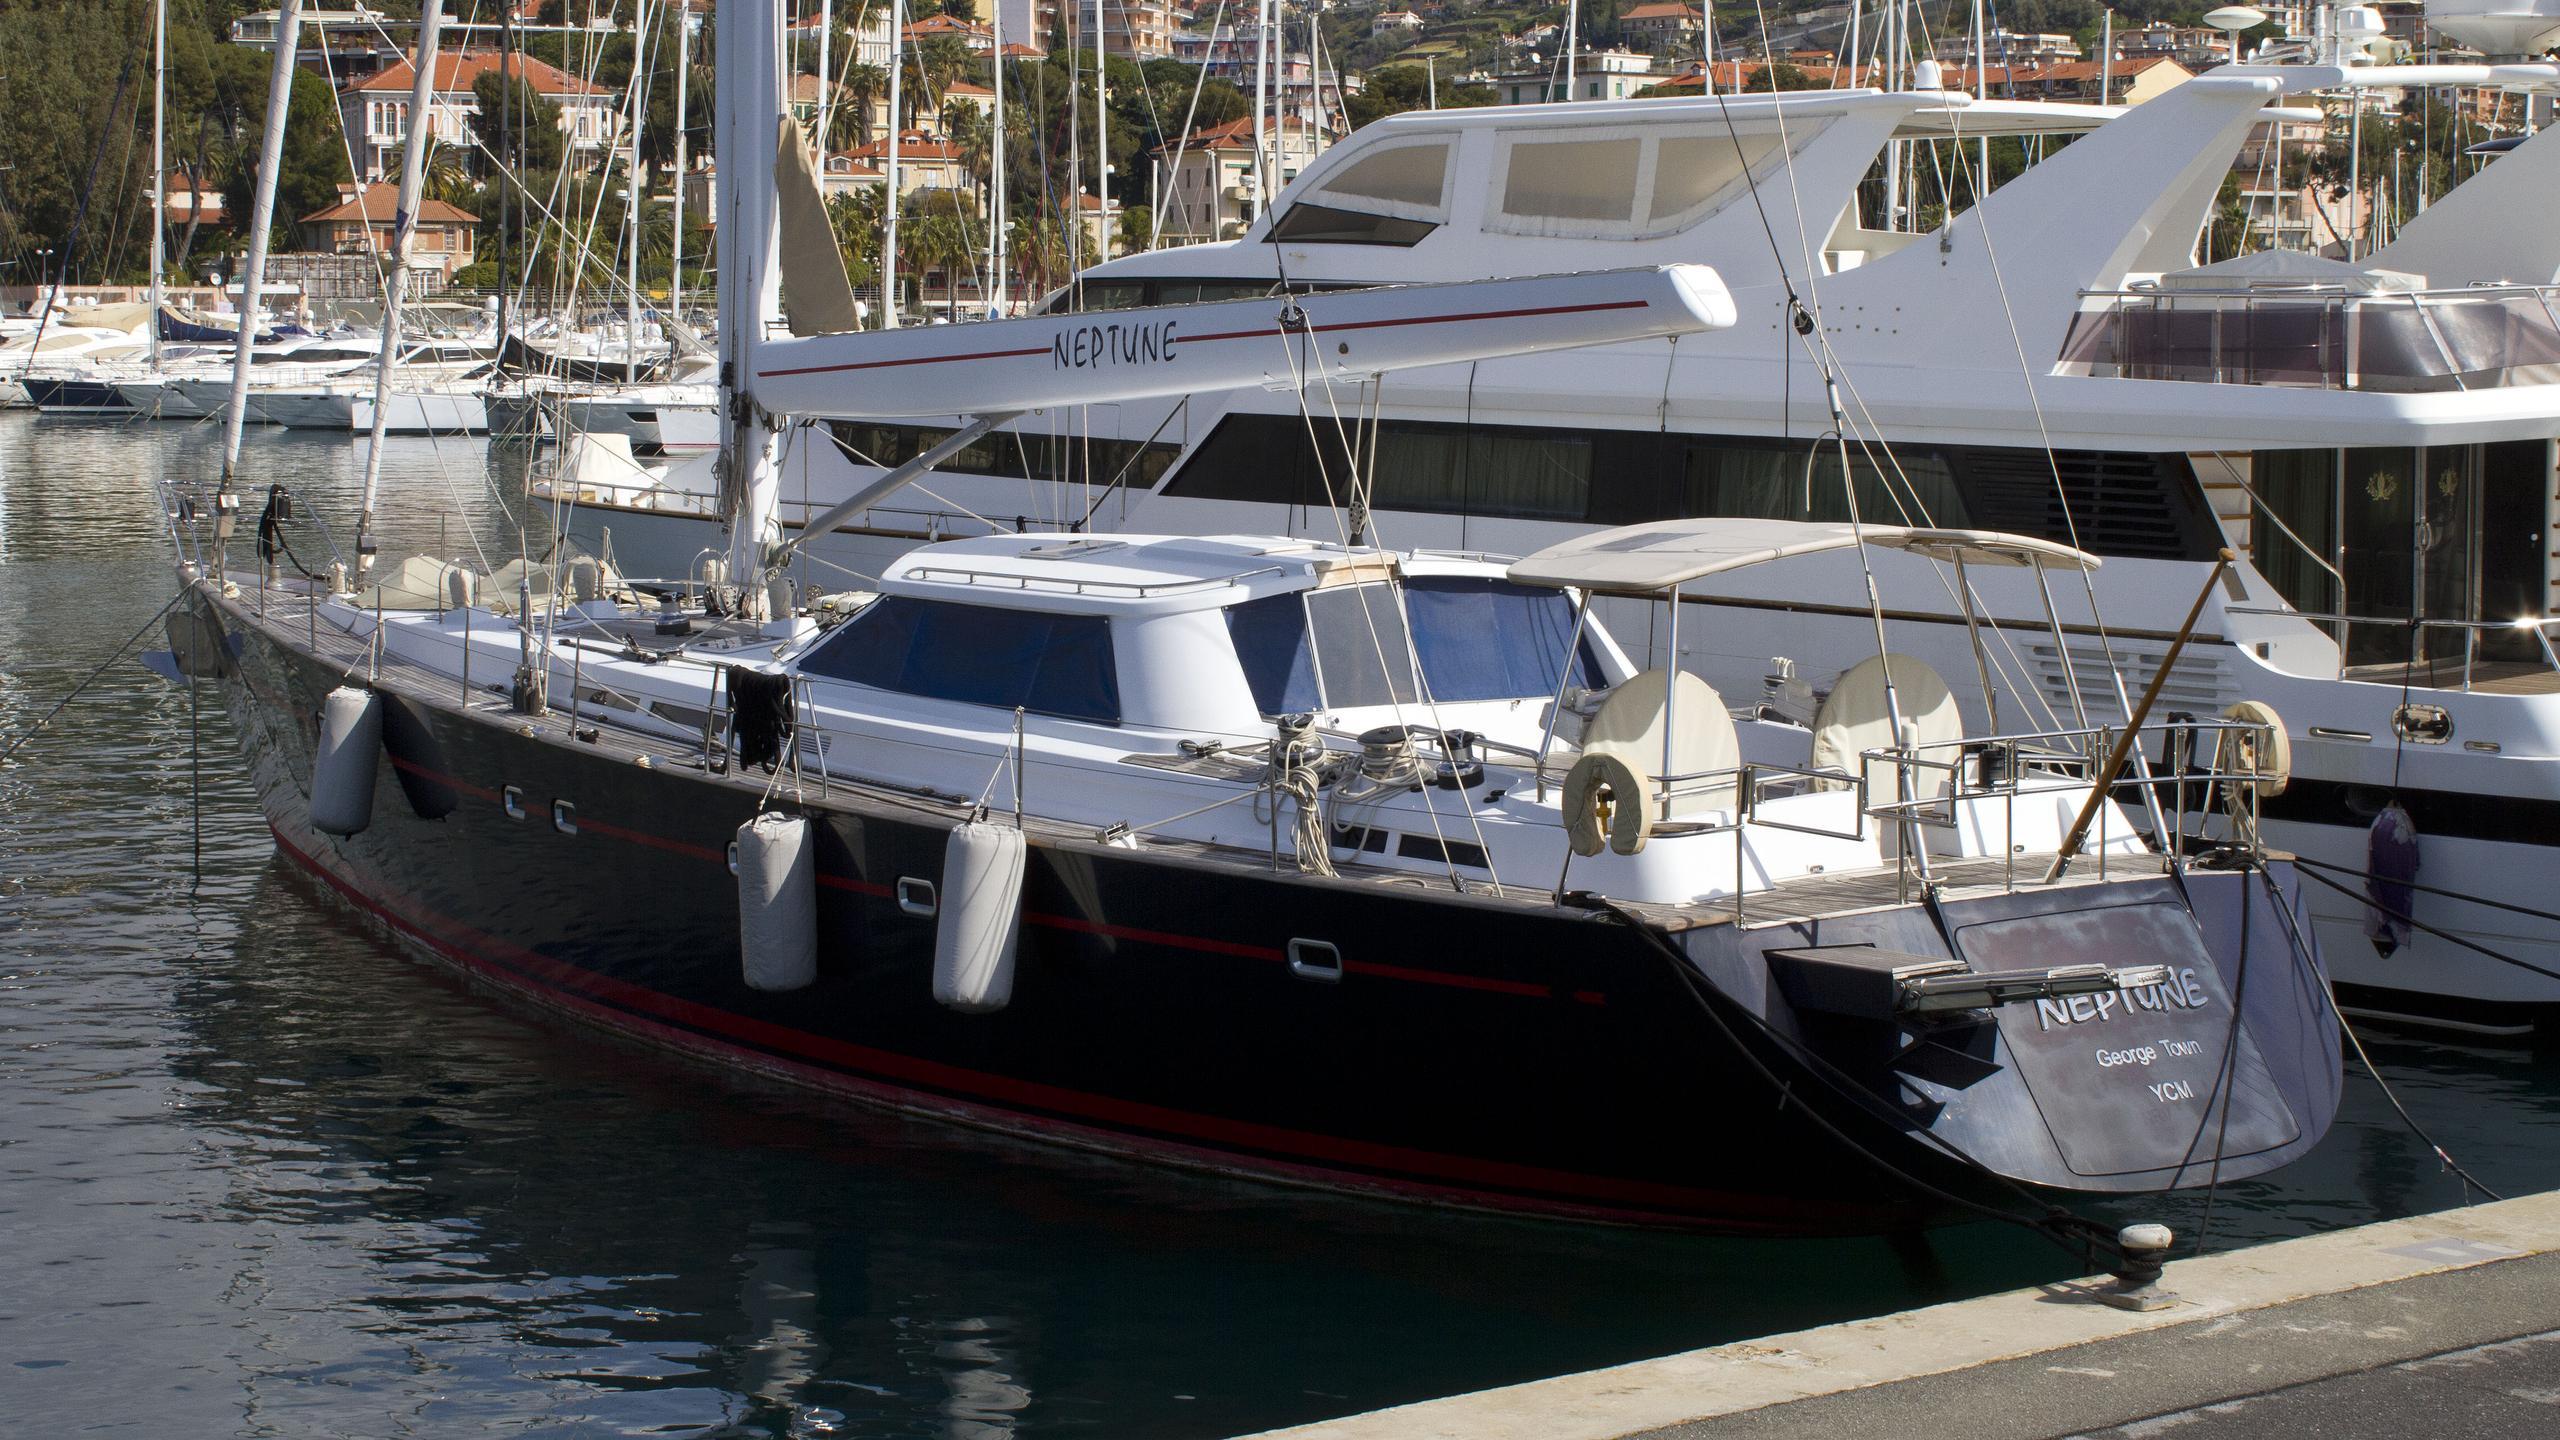 neptune-sailing-yacht-fitzory-2003-25m-stern